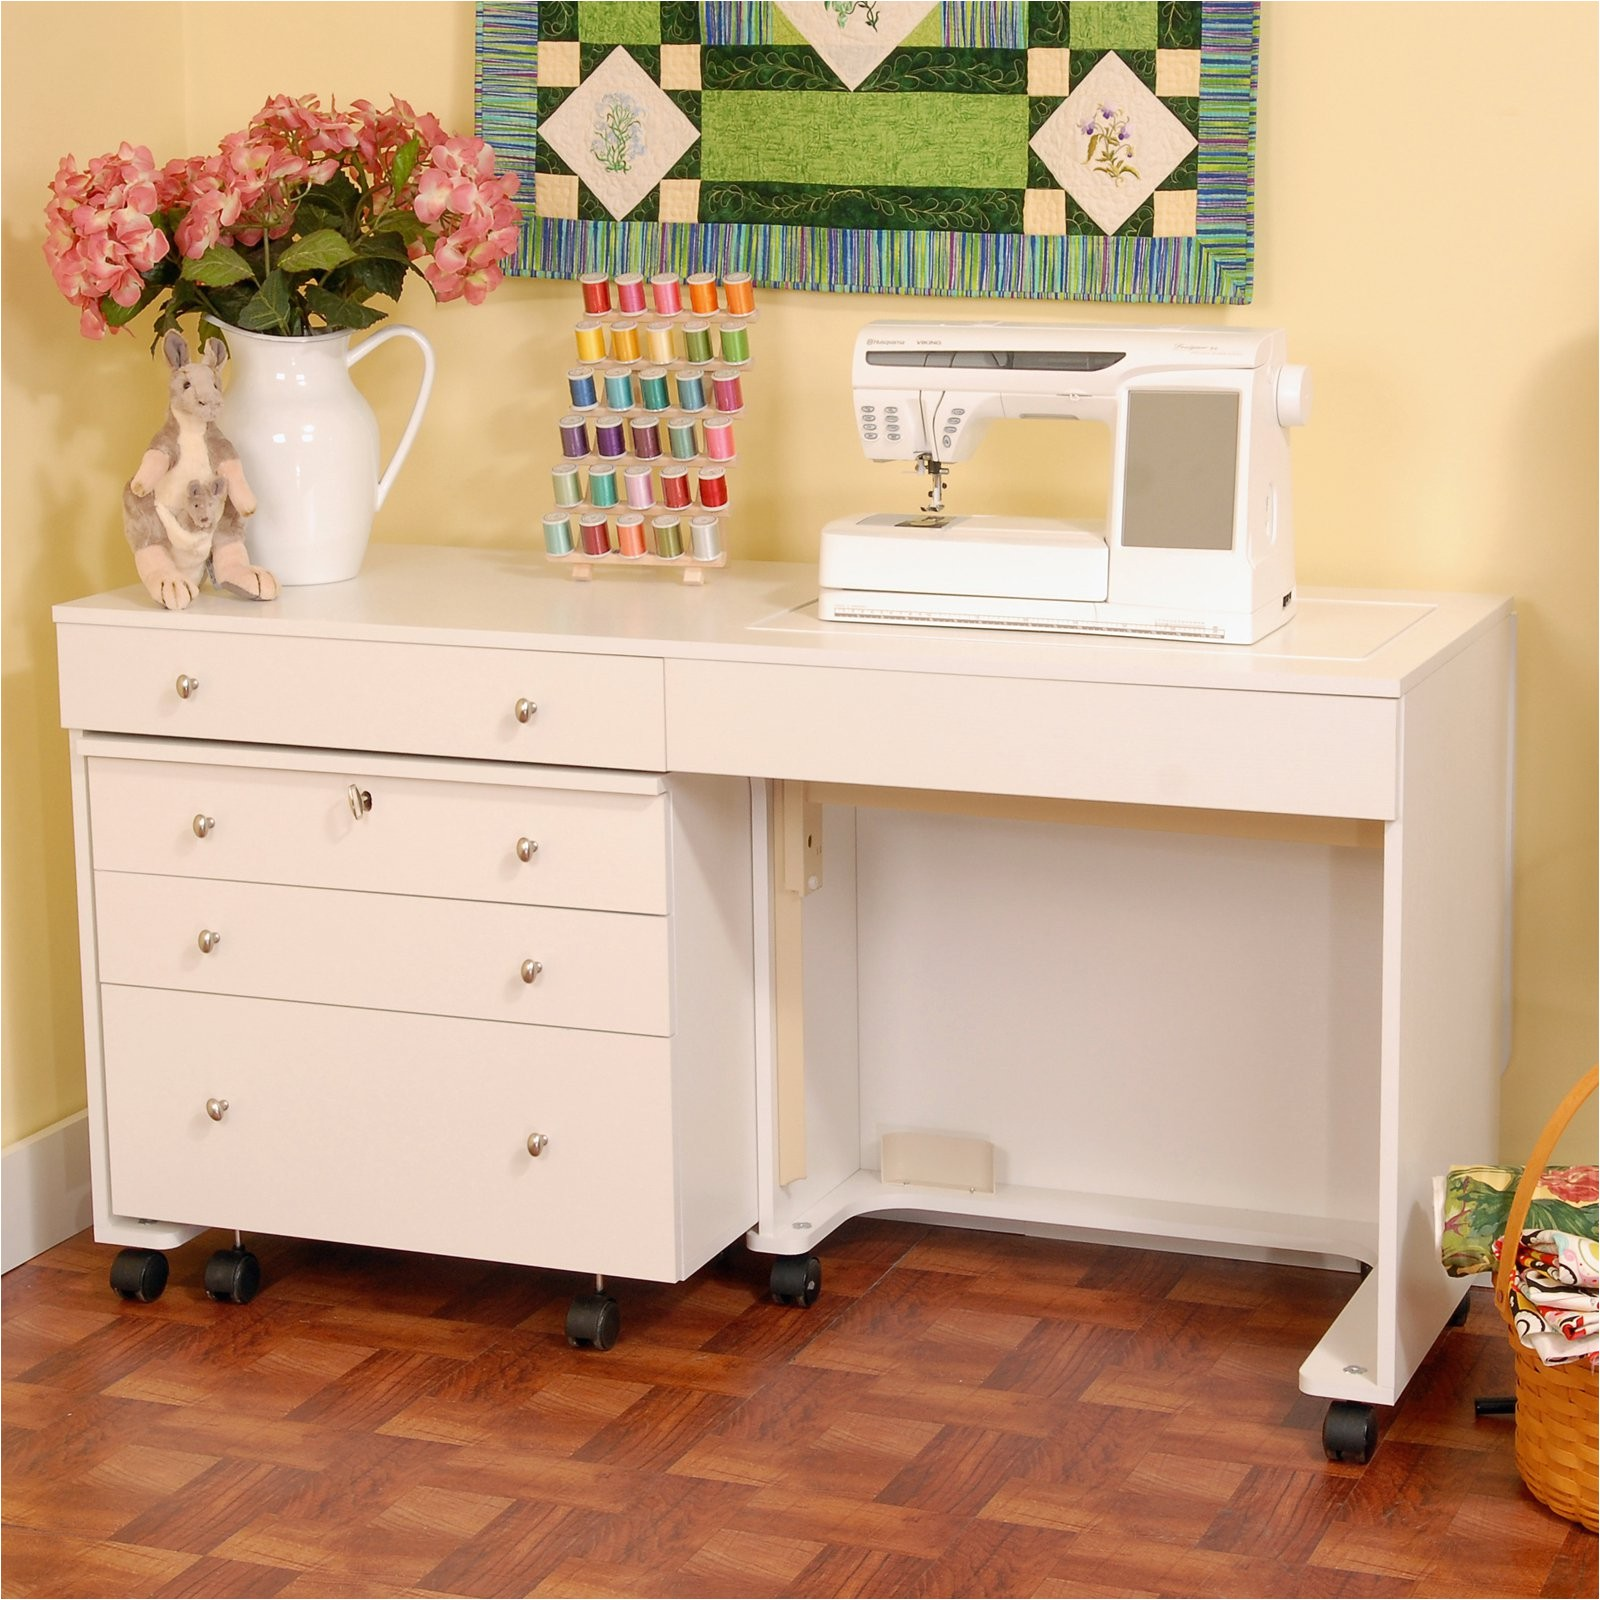 Kangaroo Sewing Cabinets Lovely Kangaroo Aussie Sewing Table by Arrow Hayneedle